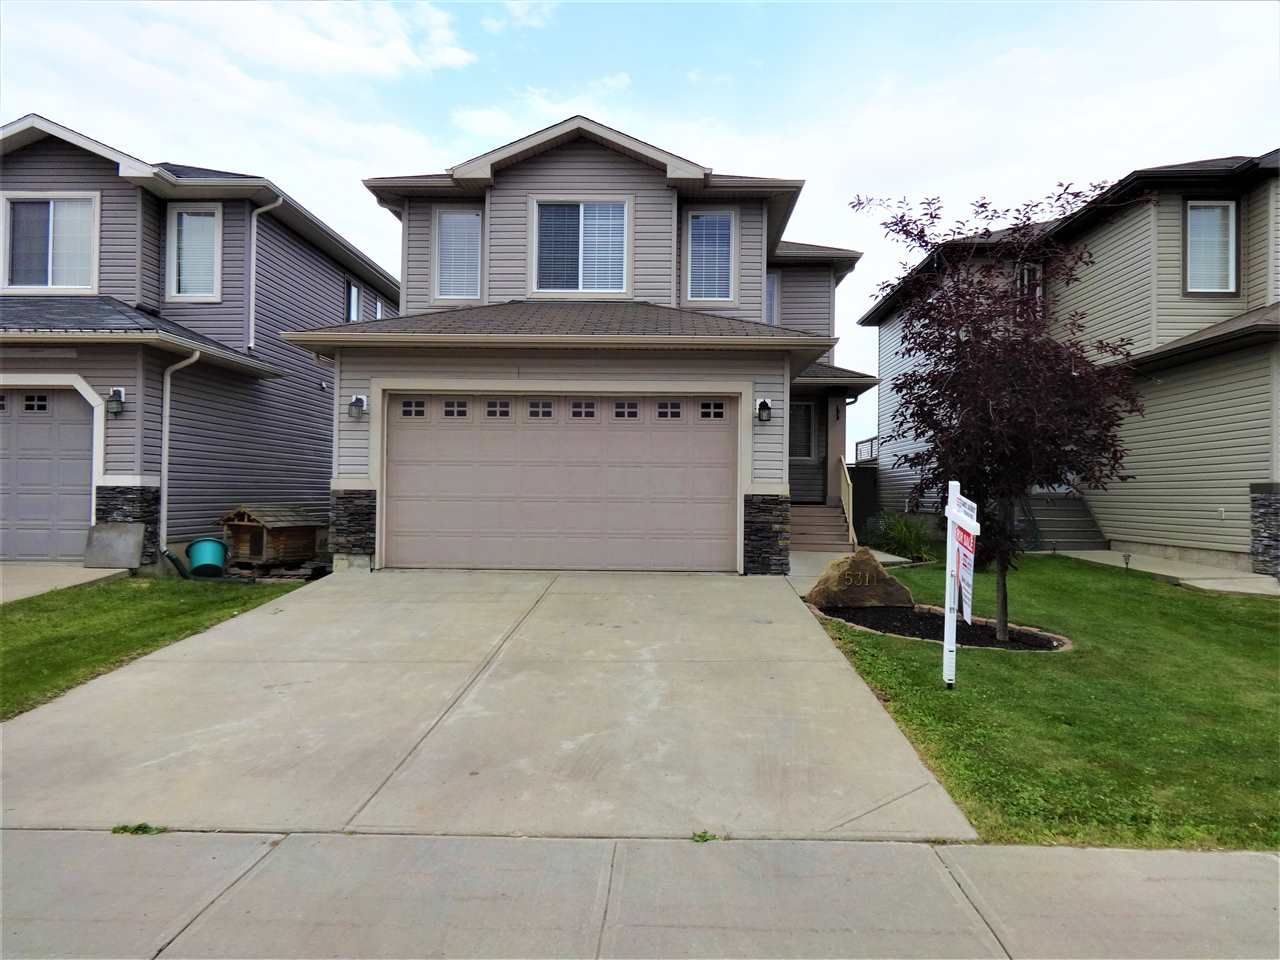 Main Photo: 5311 45 Street: Bruderheim House for sale : MLS®# E4211646